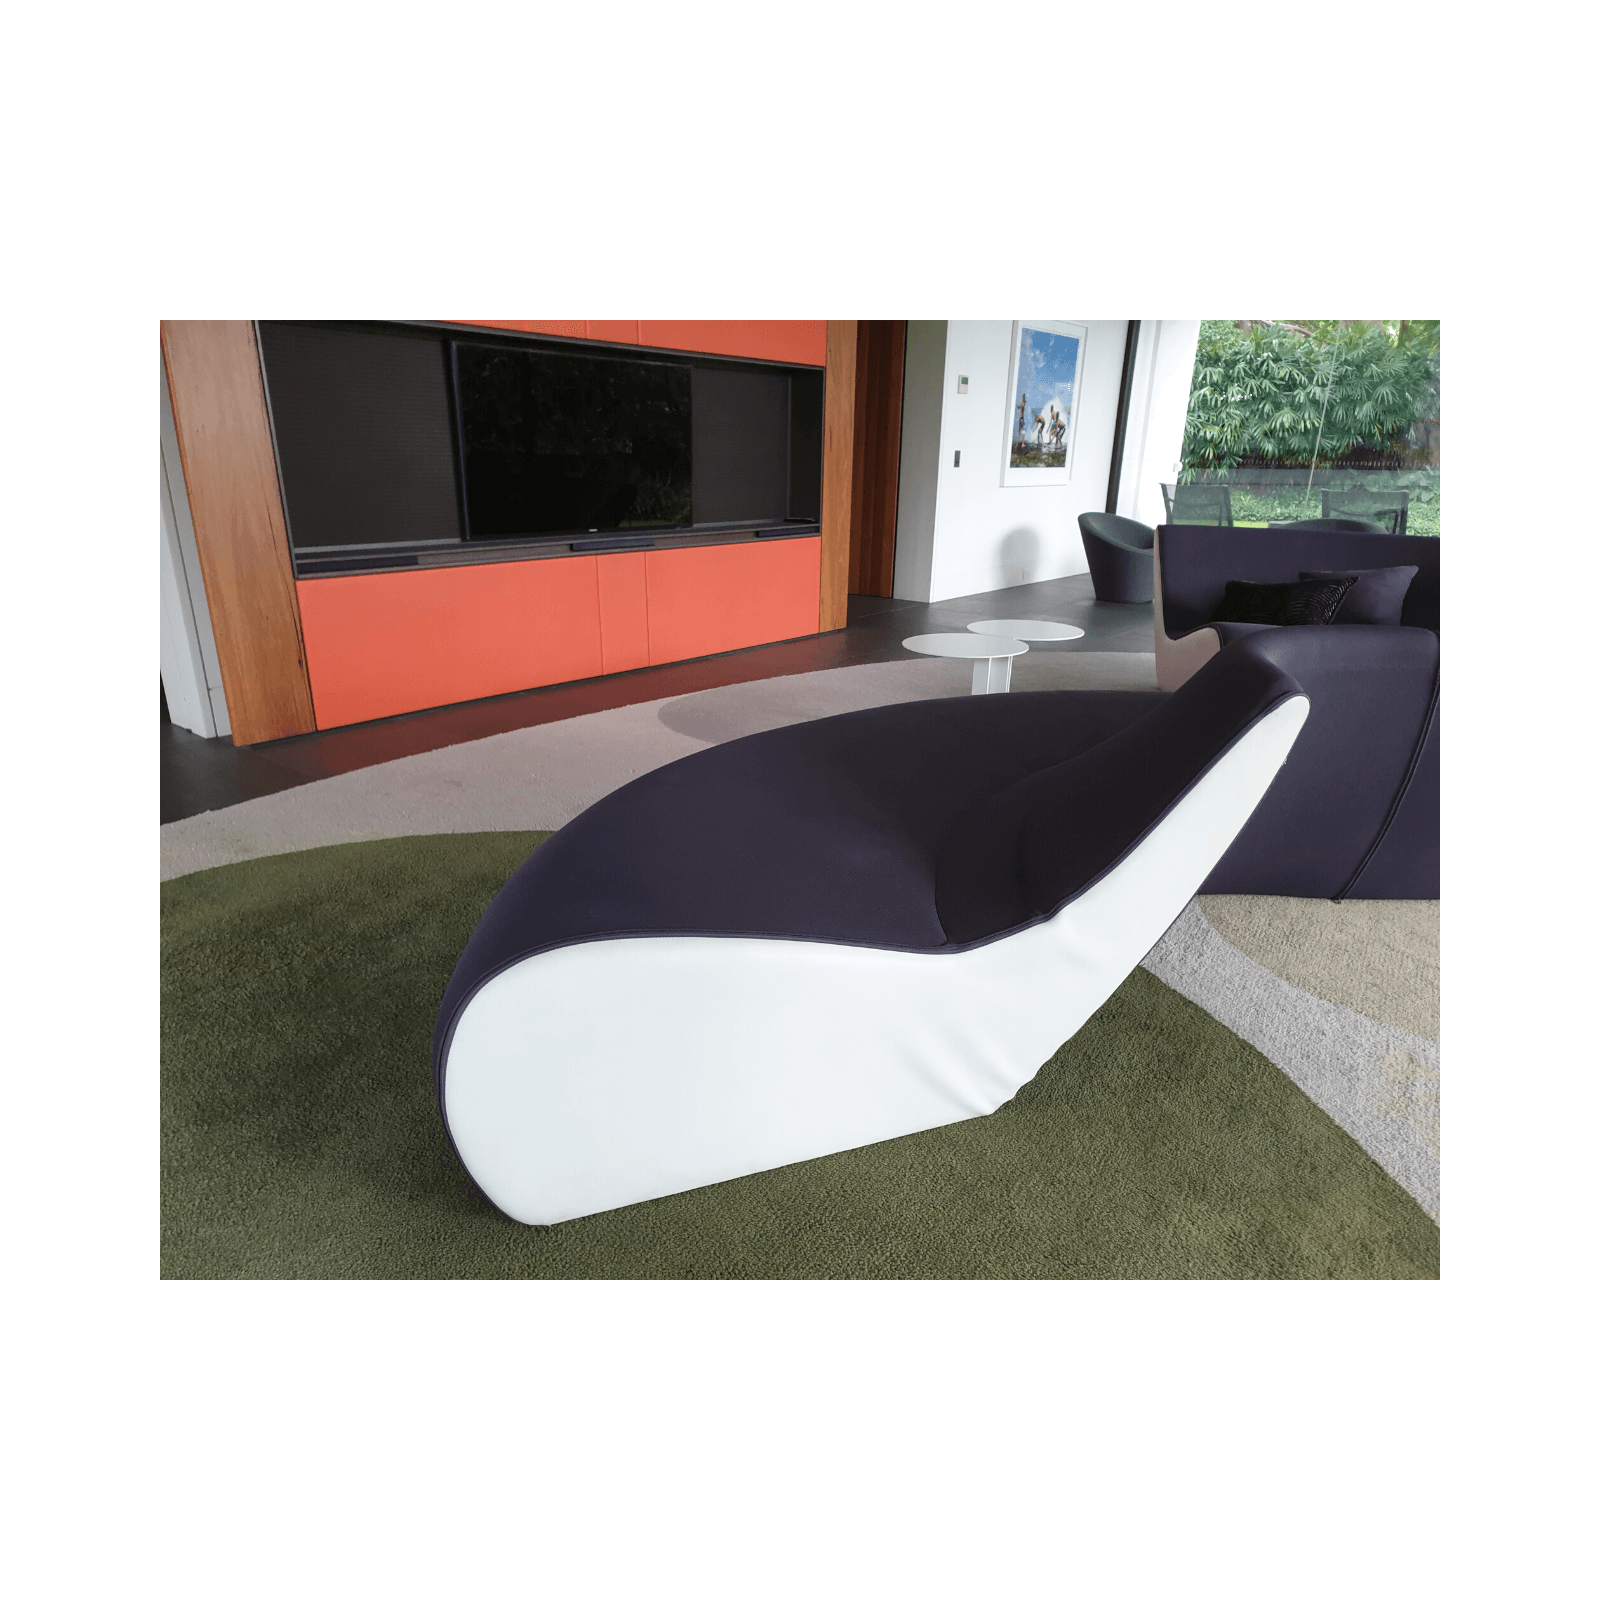 Two Design Lovers Walter Knoll Circle Sofa 5